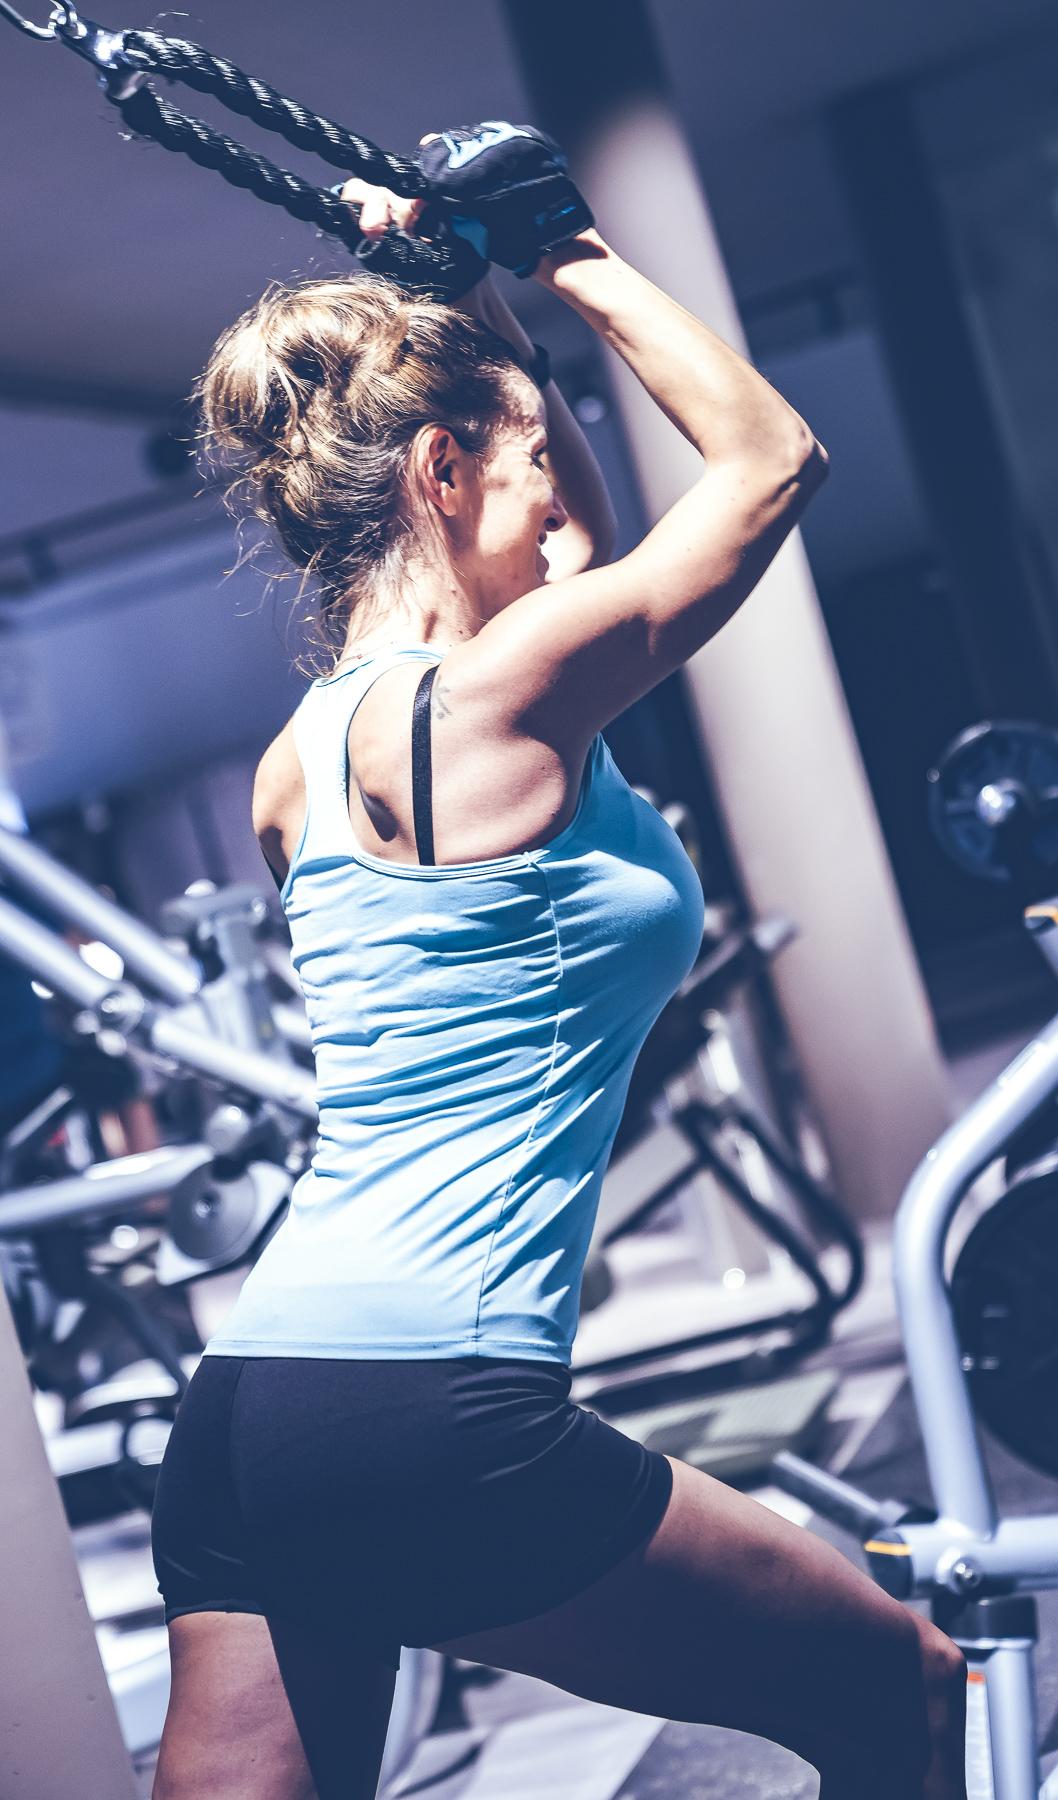 Gesundheit Plus, Physio-Reha-Medizinisches Training